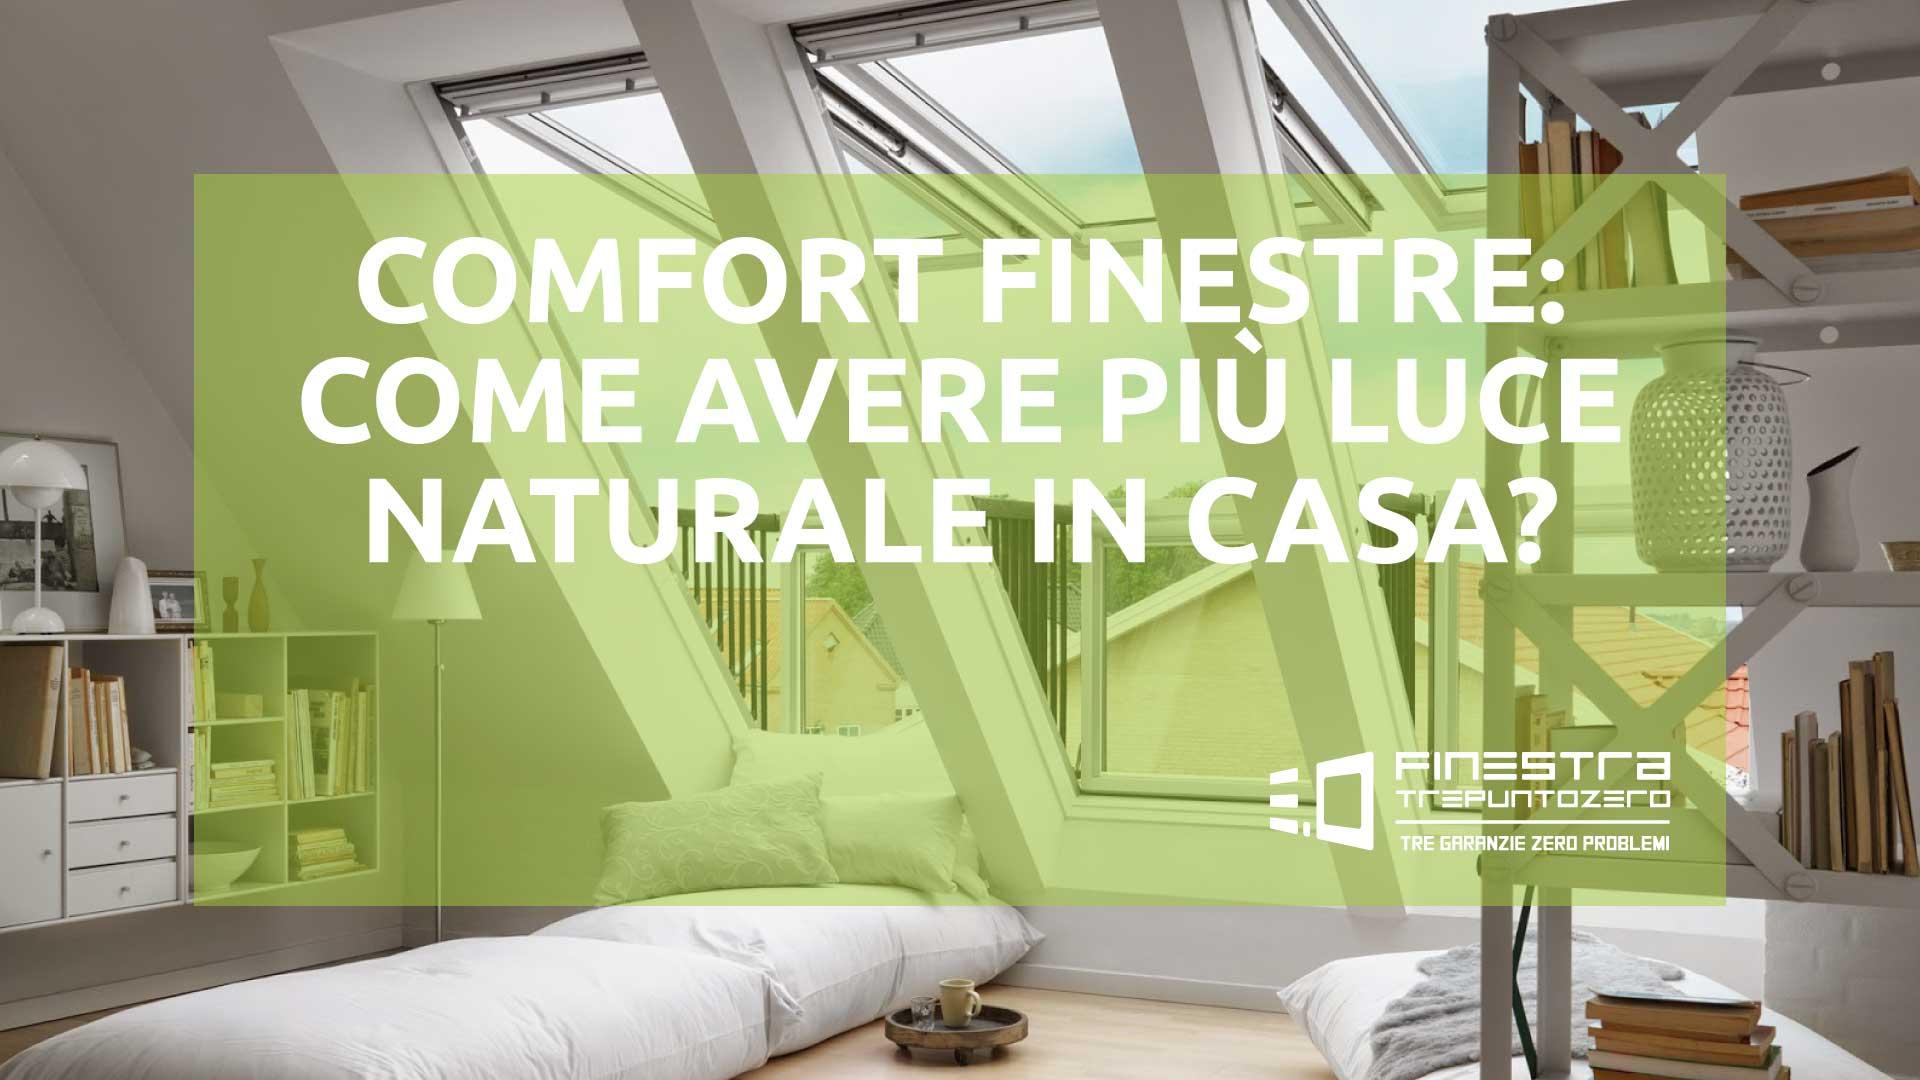 Comfort finestre: come avere più luce naturale in casa?